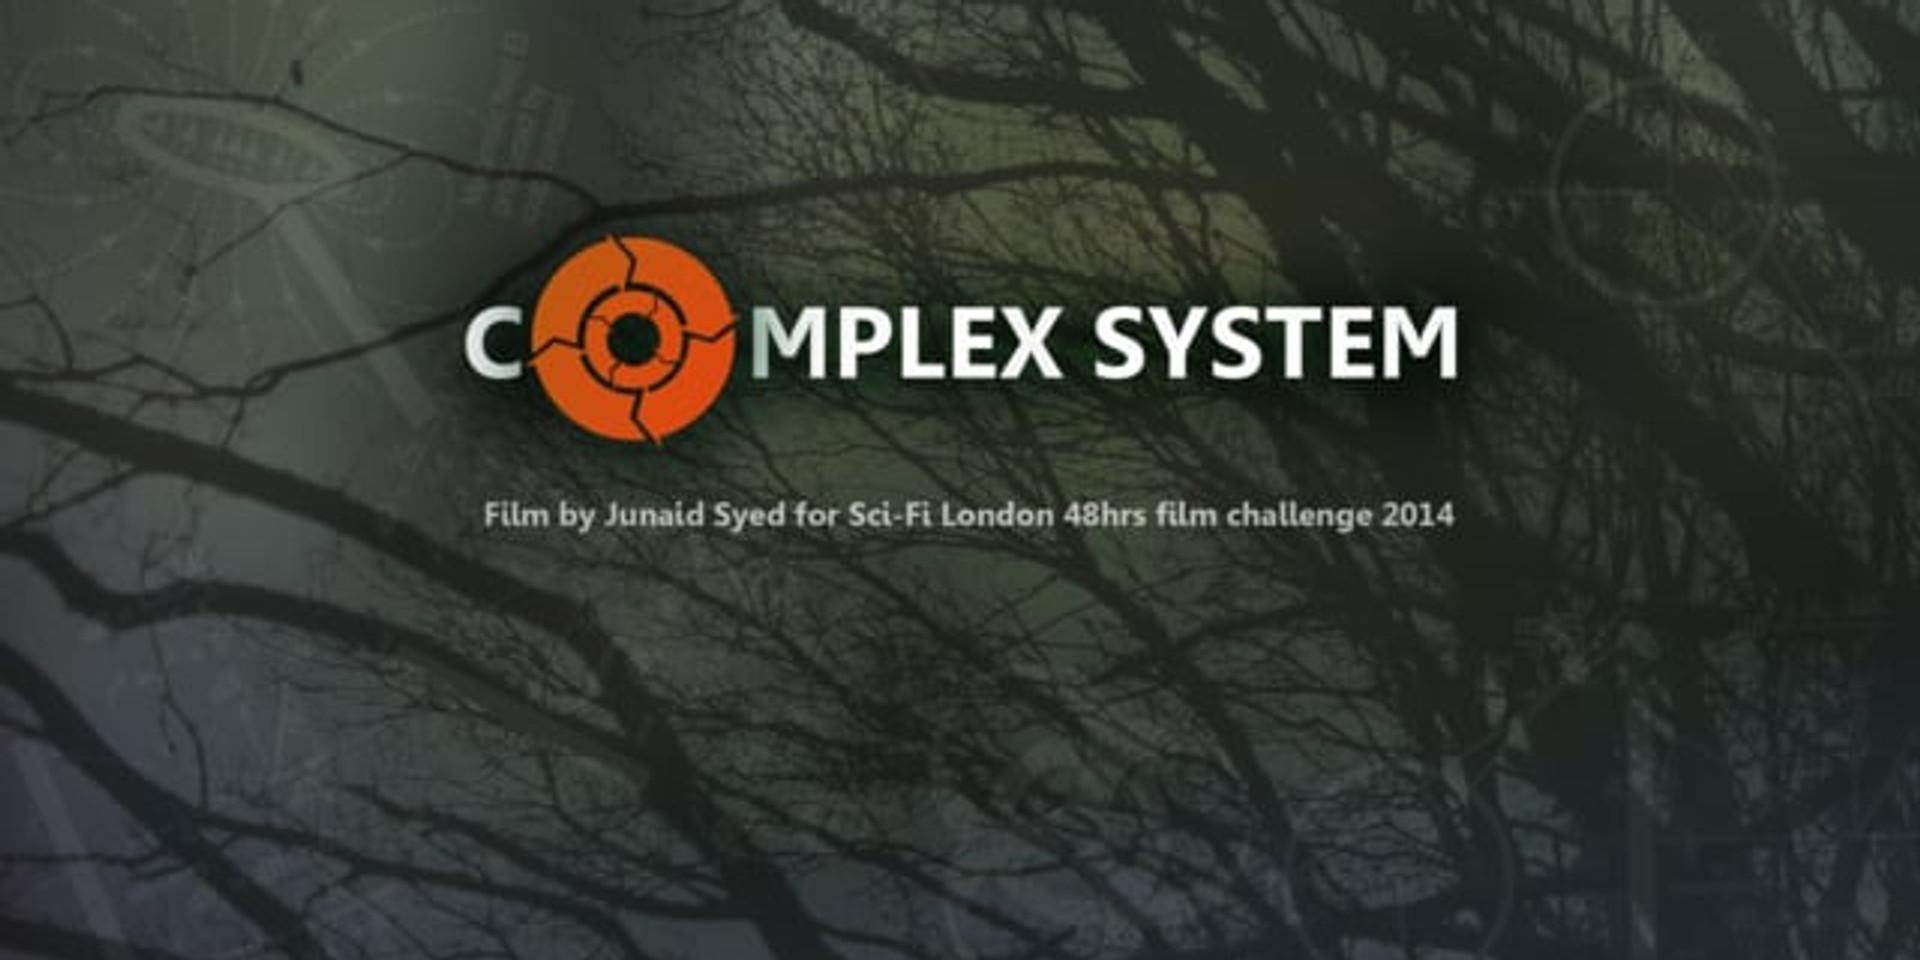 Complex System - Short Film